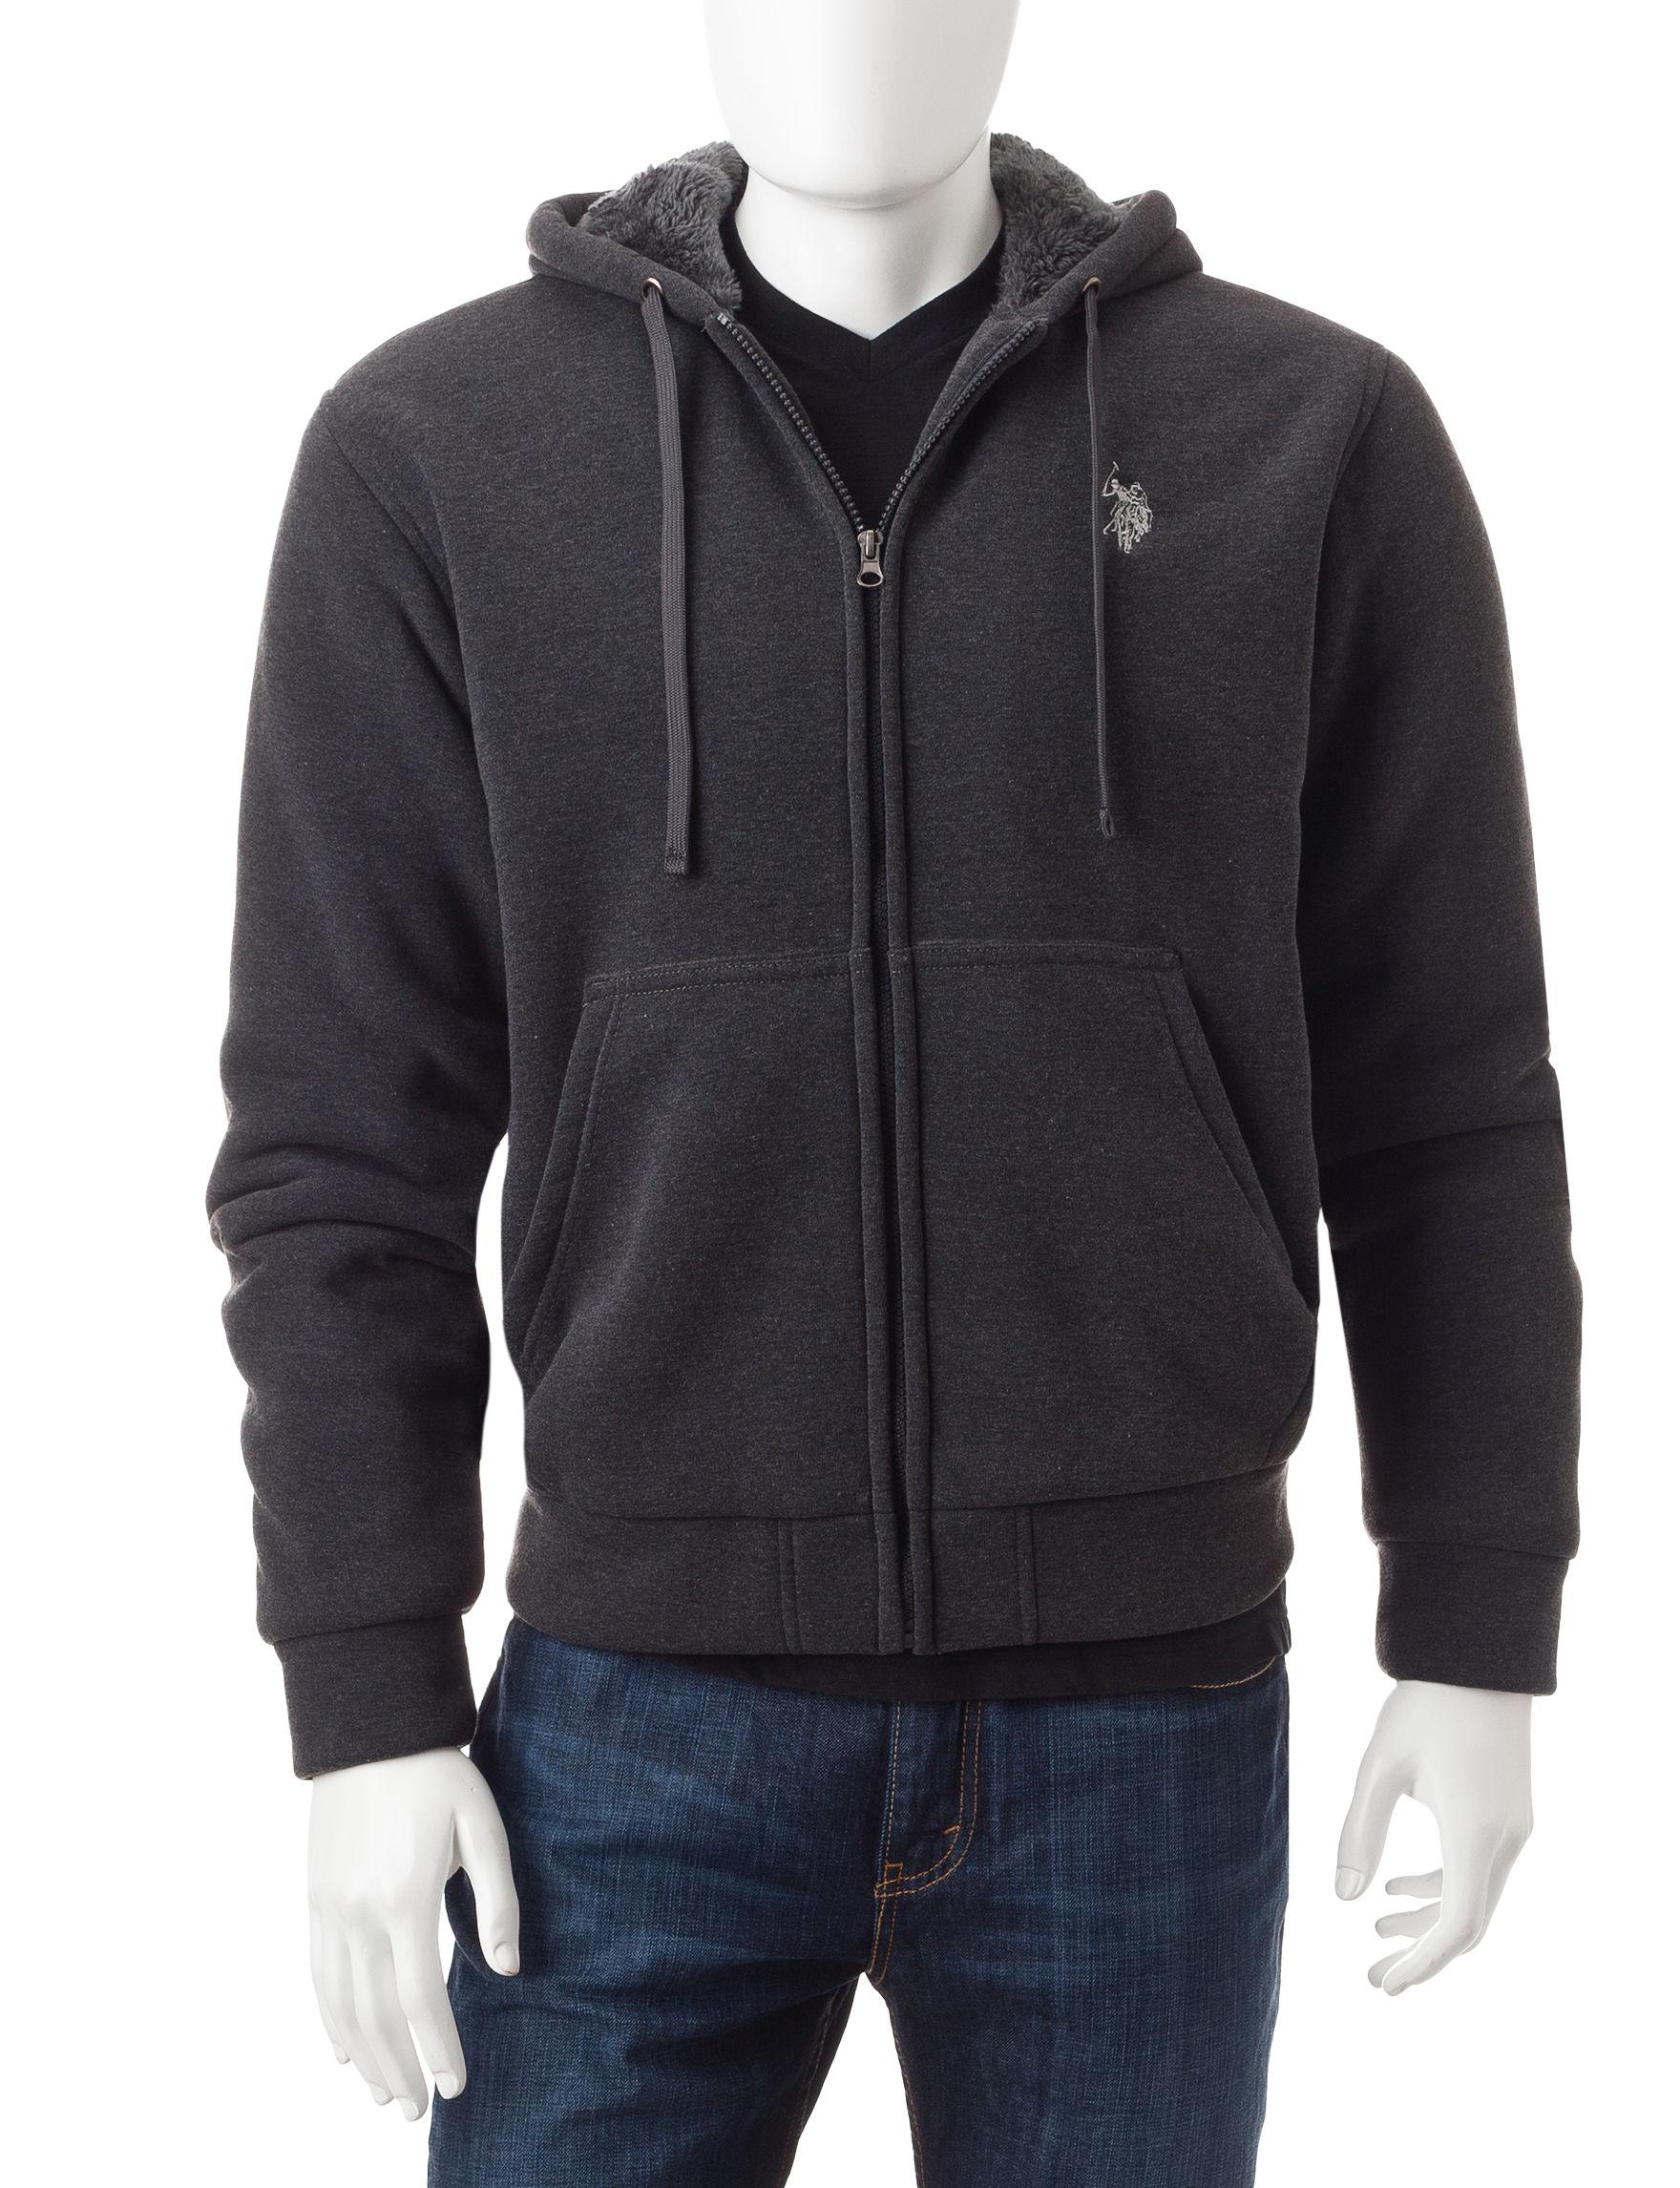 U.S. Polo Assn. Grey Lightweight Jackets & Blazers